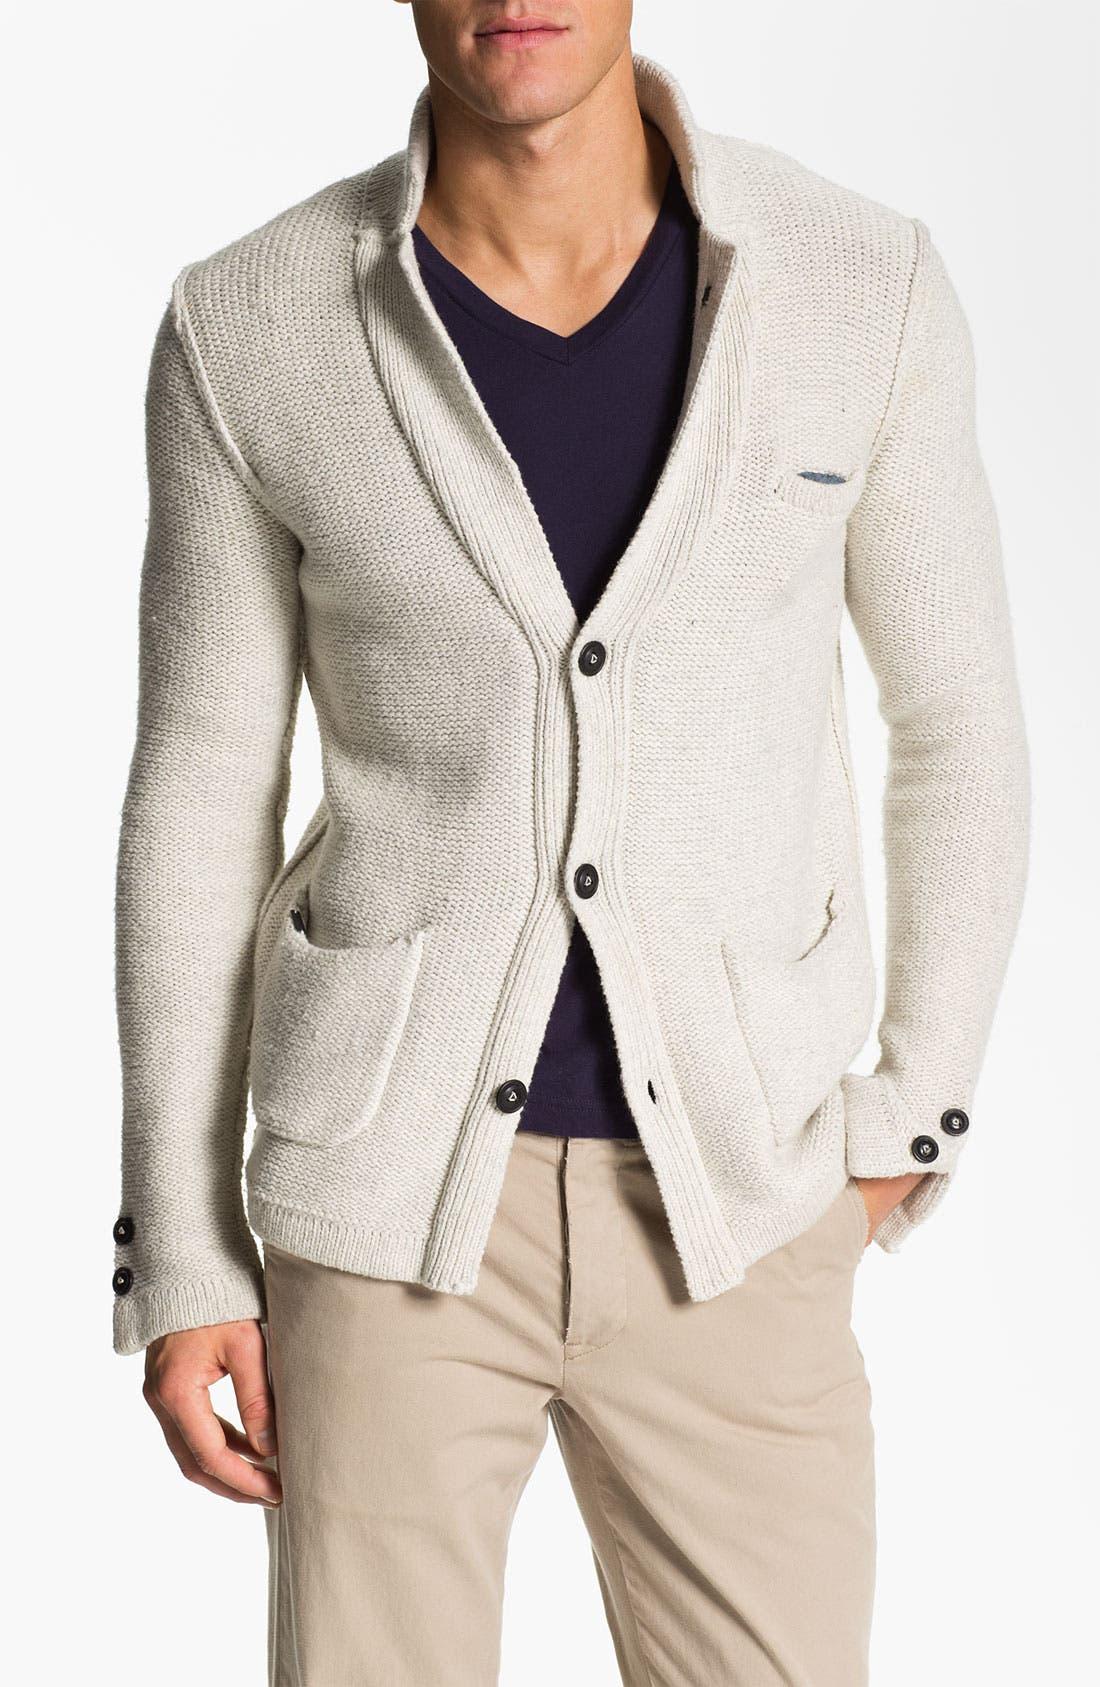 Main Image - J.C. Rags Reverse Knit Three Button Sweater Blazer